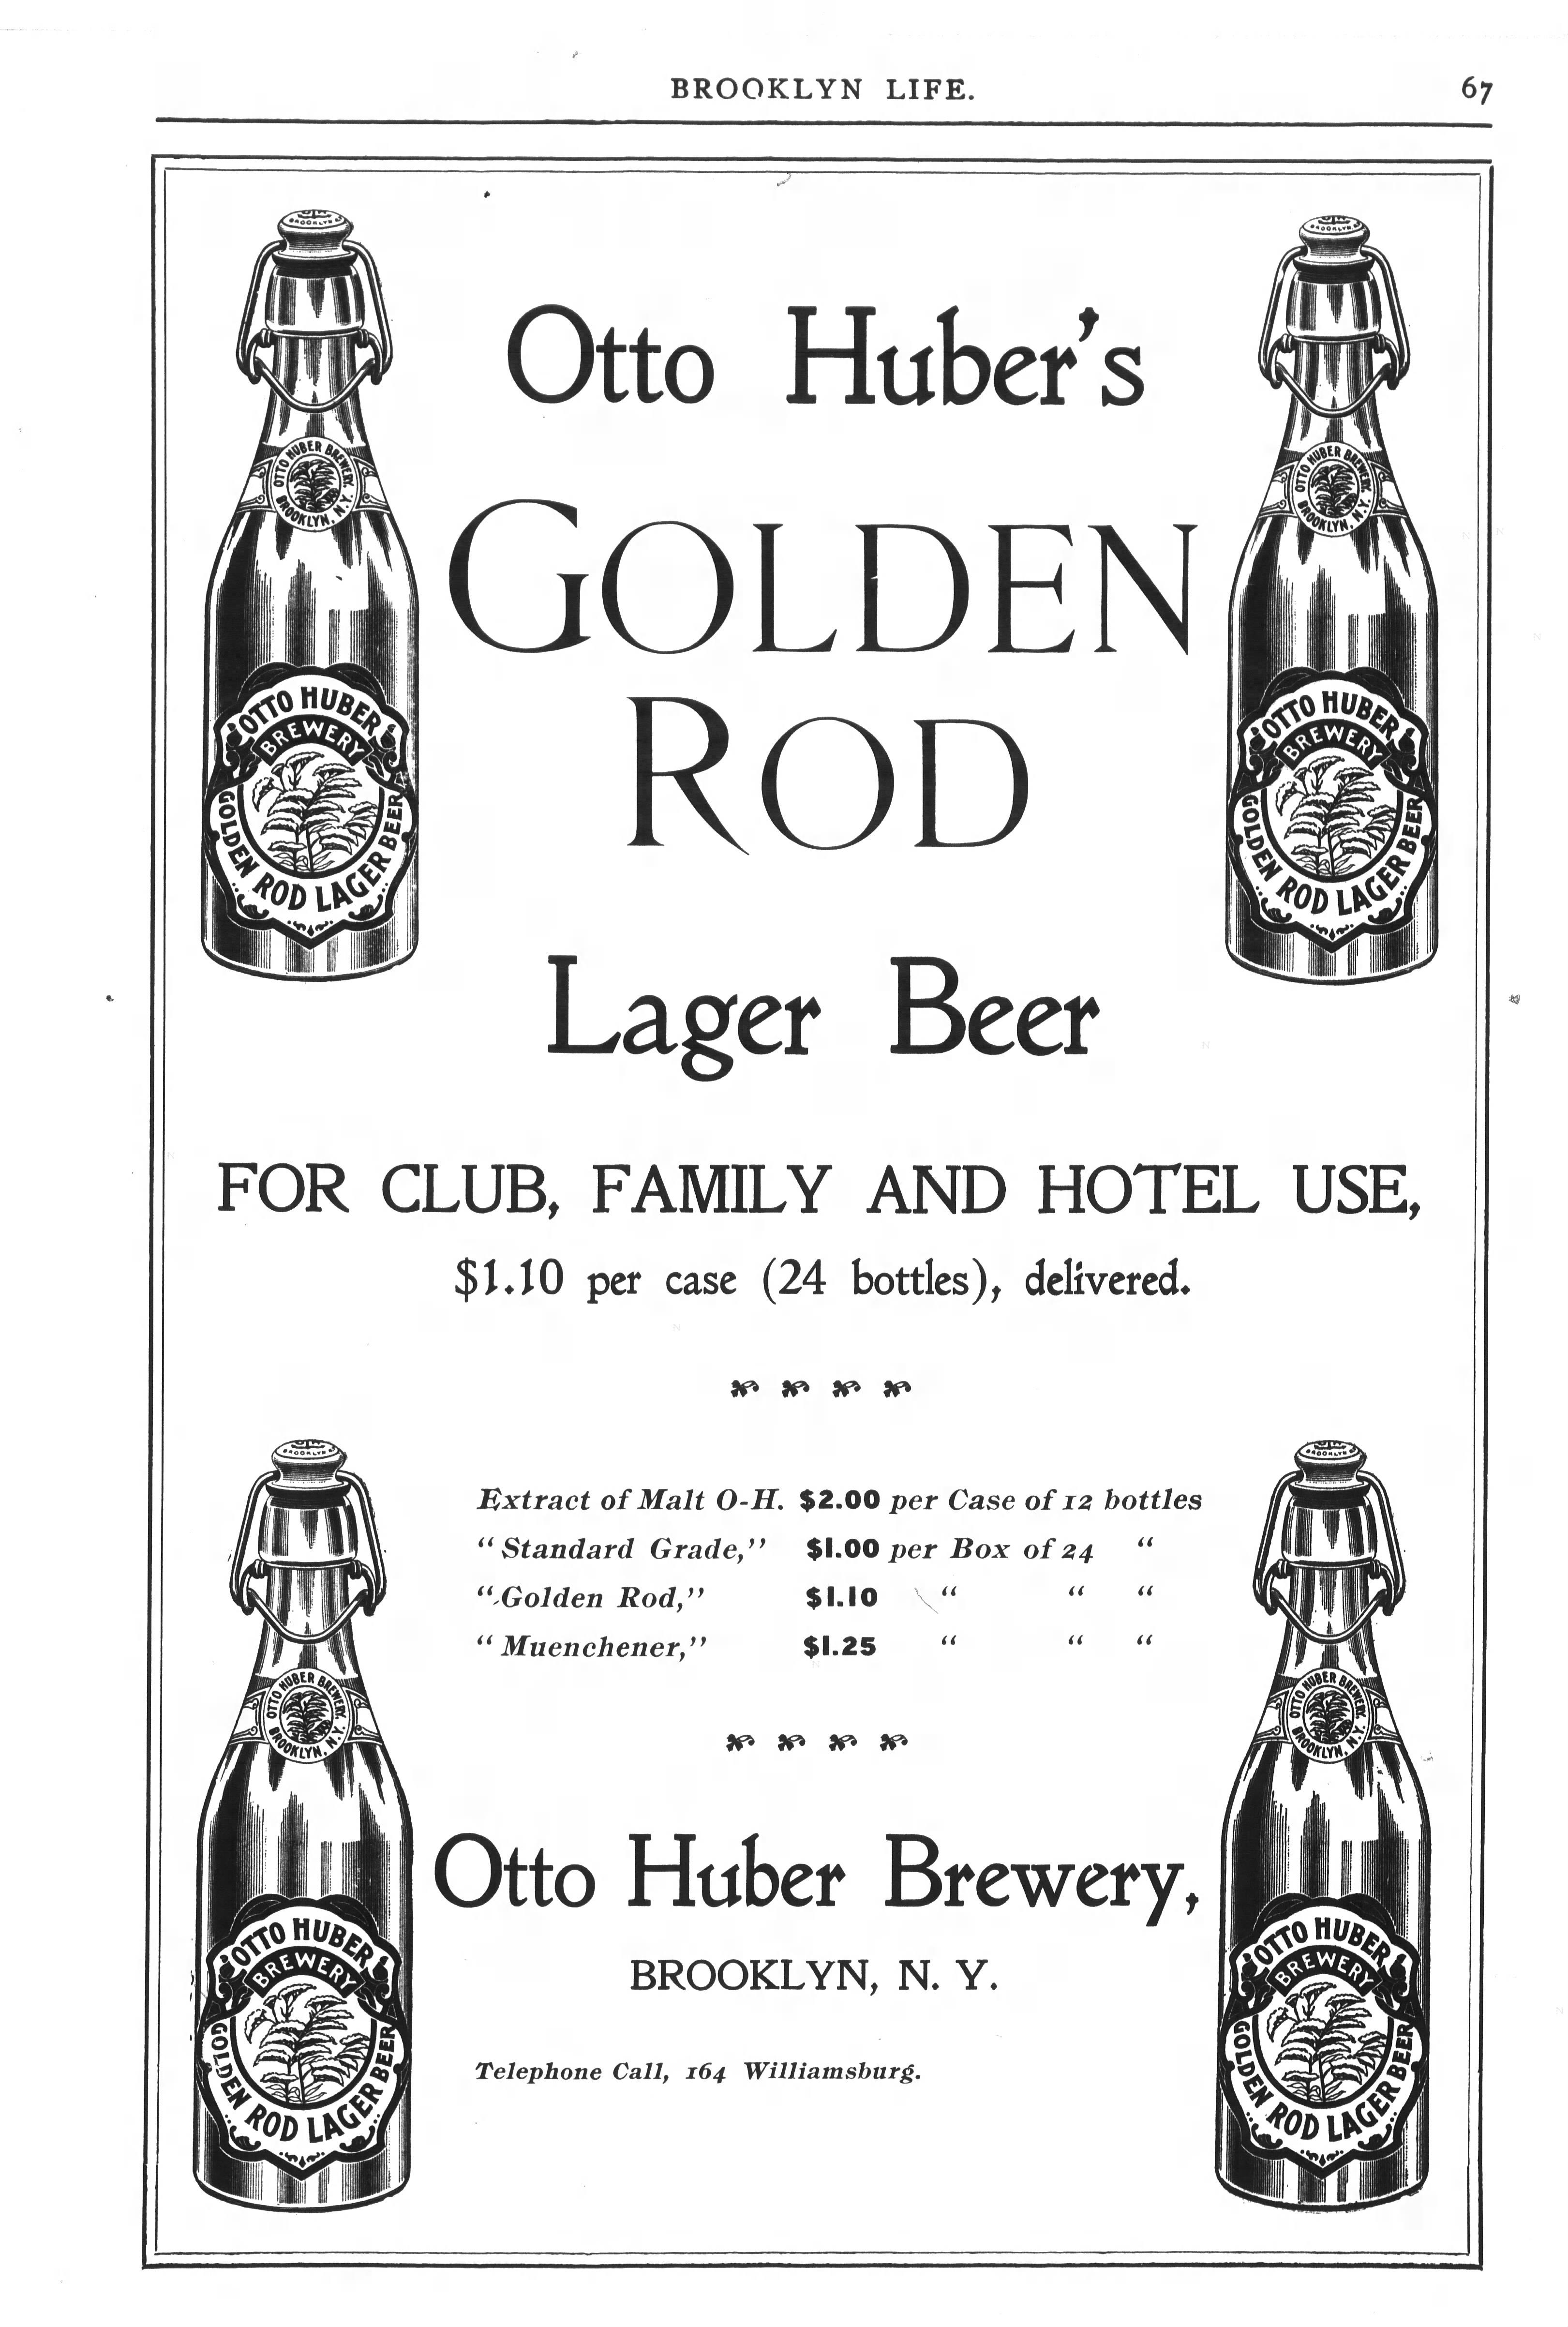 Otto Huber Brewery_Brooklyn_Life_New York_Sat__Mar_26__1898.jpg